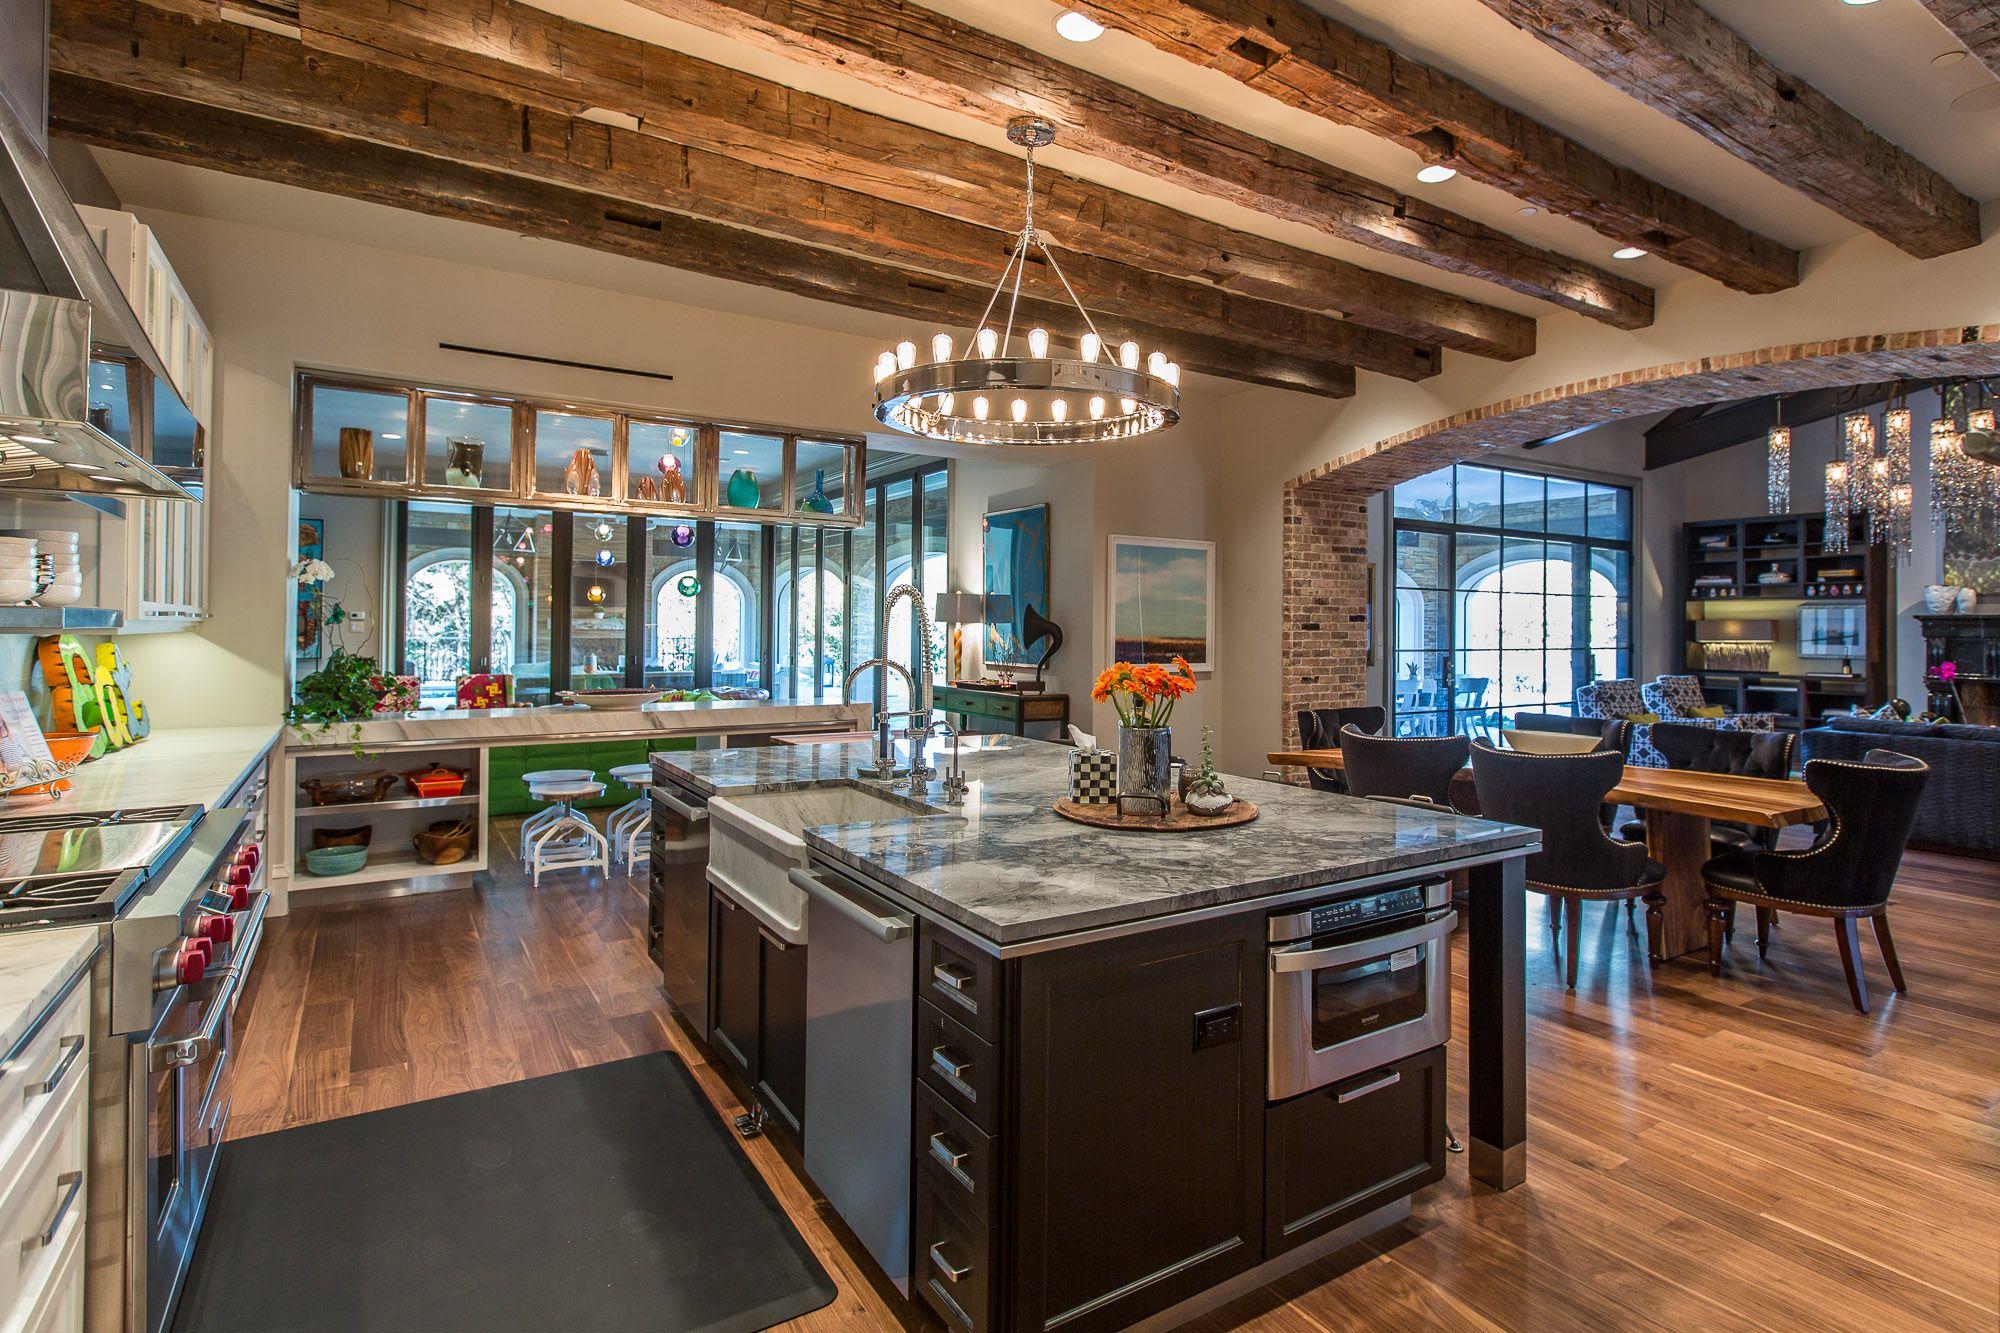 love brick archway large island and beams luxury kitchens kitchen design kitchen interior on kitchen interior luxury id=96475